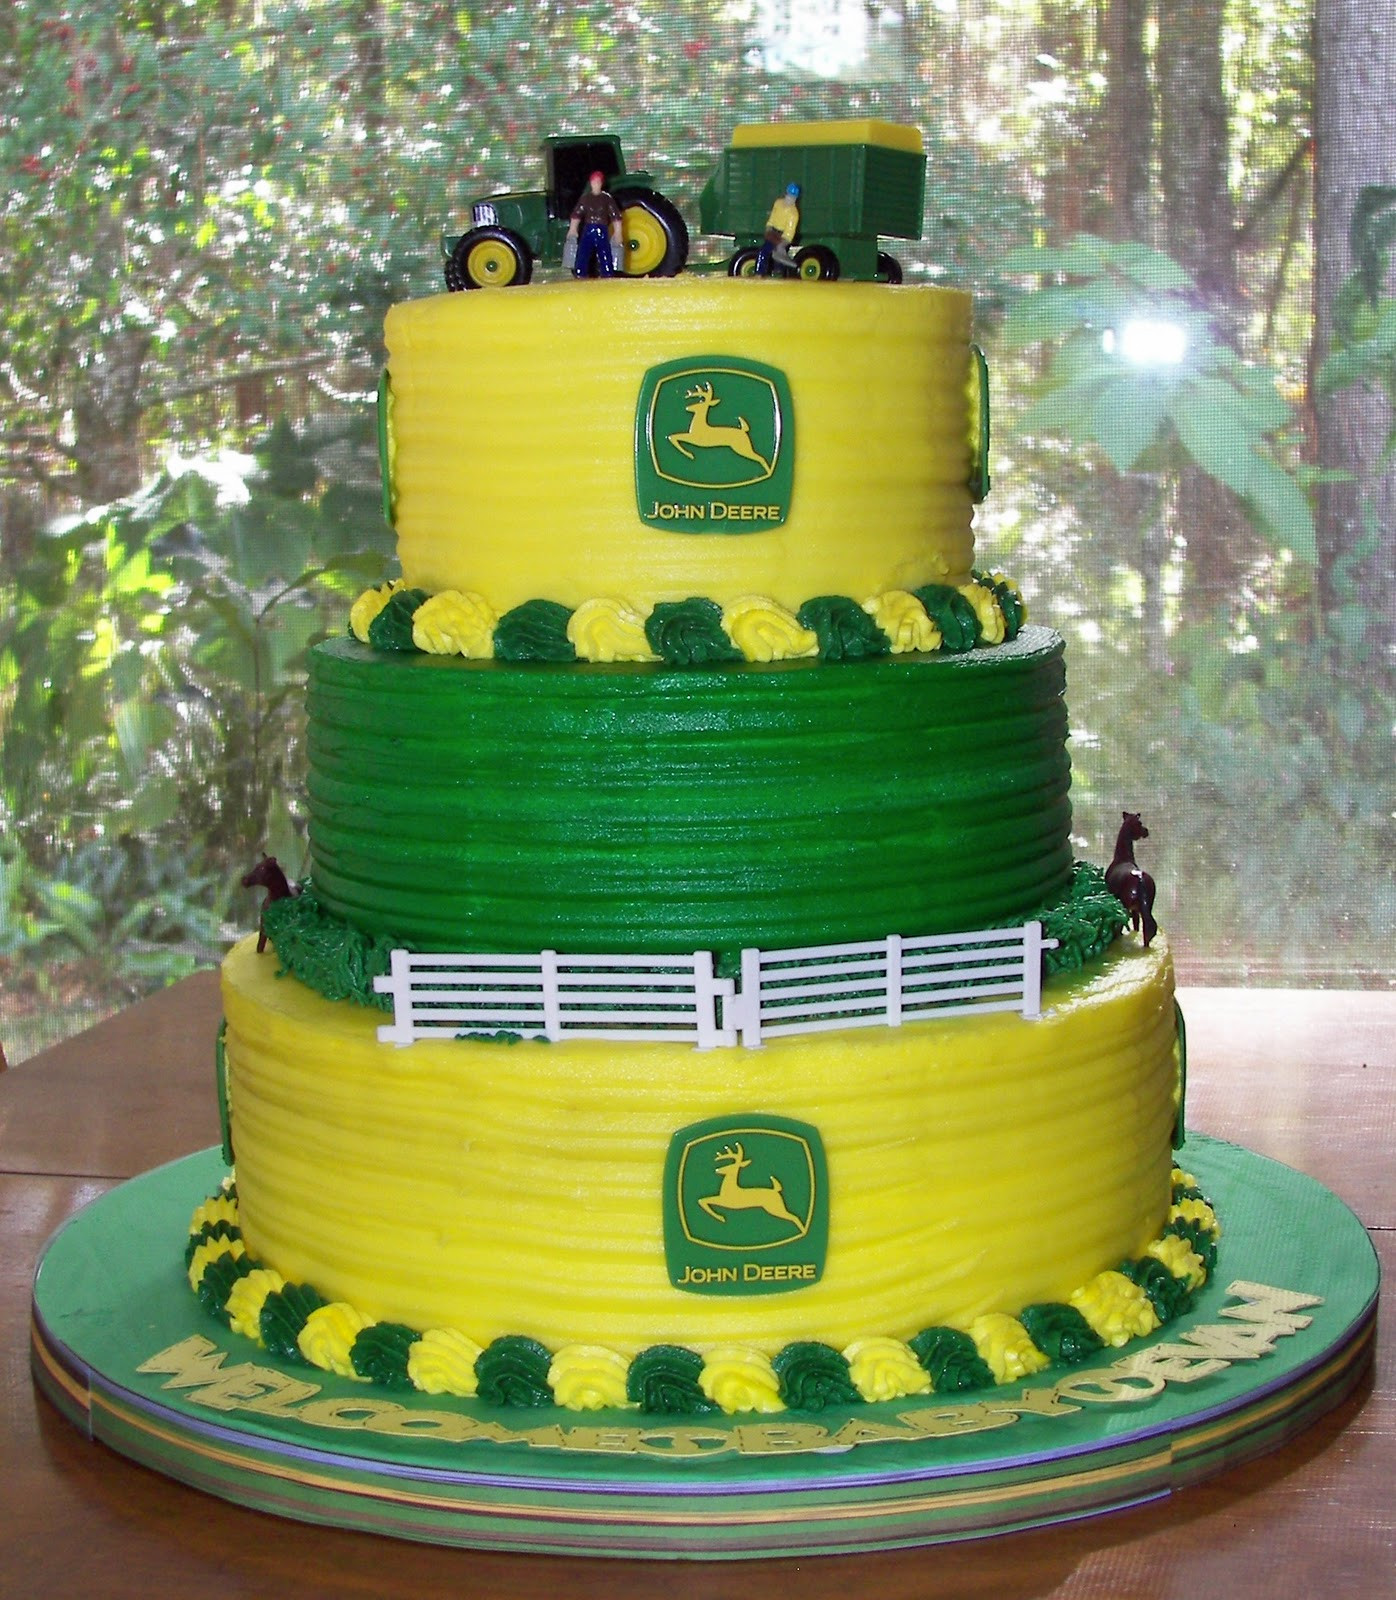 John Deere Wedding Cakes  John Deere Cakes Ideas